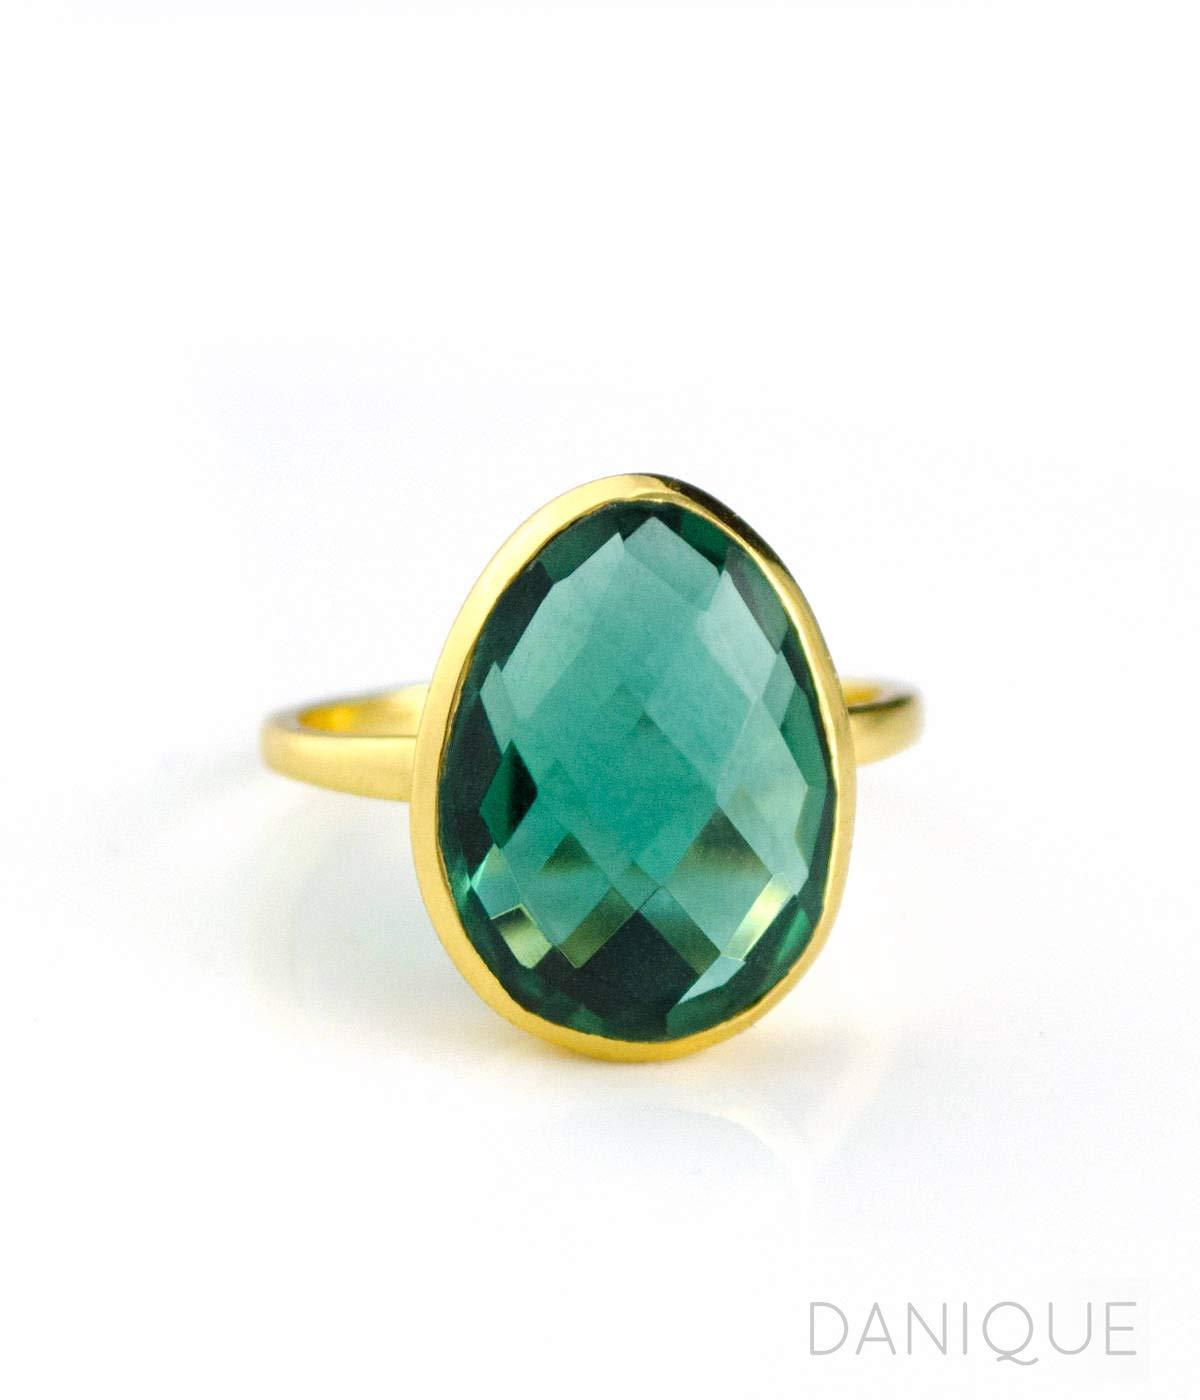 1.5 mm Round Cut Tourmaline Ring Dainty Green Tourmaline Stackable Ring Synthetic Green Tourmaline Stacker Silver Ring October Birthstone